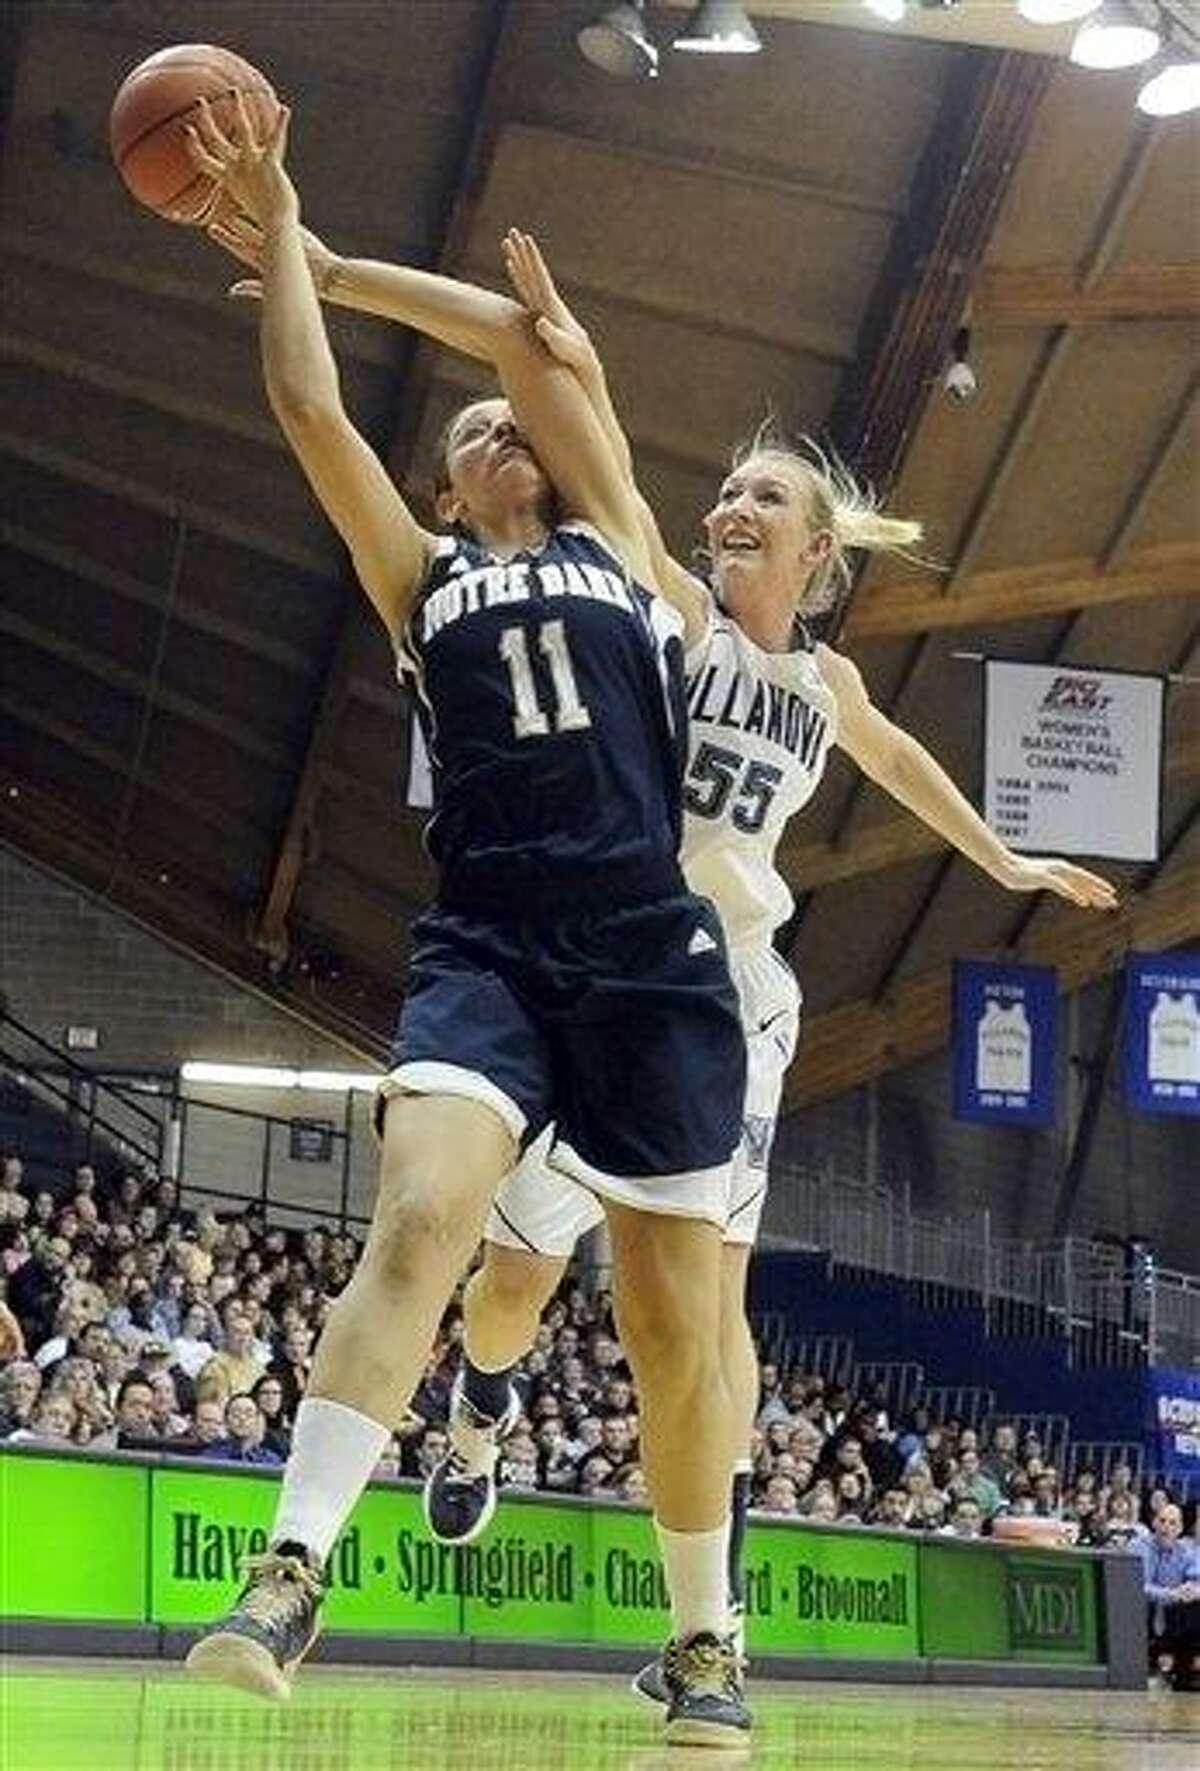 Villanova's Emily Leer (55) fouls Notre Dame's Natalie Achonwa (11) during the second half of an NCAA college basketball game, Tuesday, Feb. 5, 2013, in Villanova, Pa. Notre Dame won, 59-52. (AP Photo/Michael Perez)